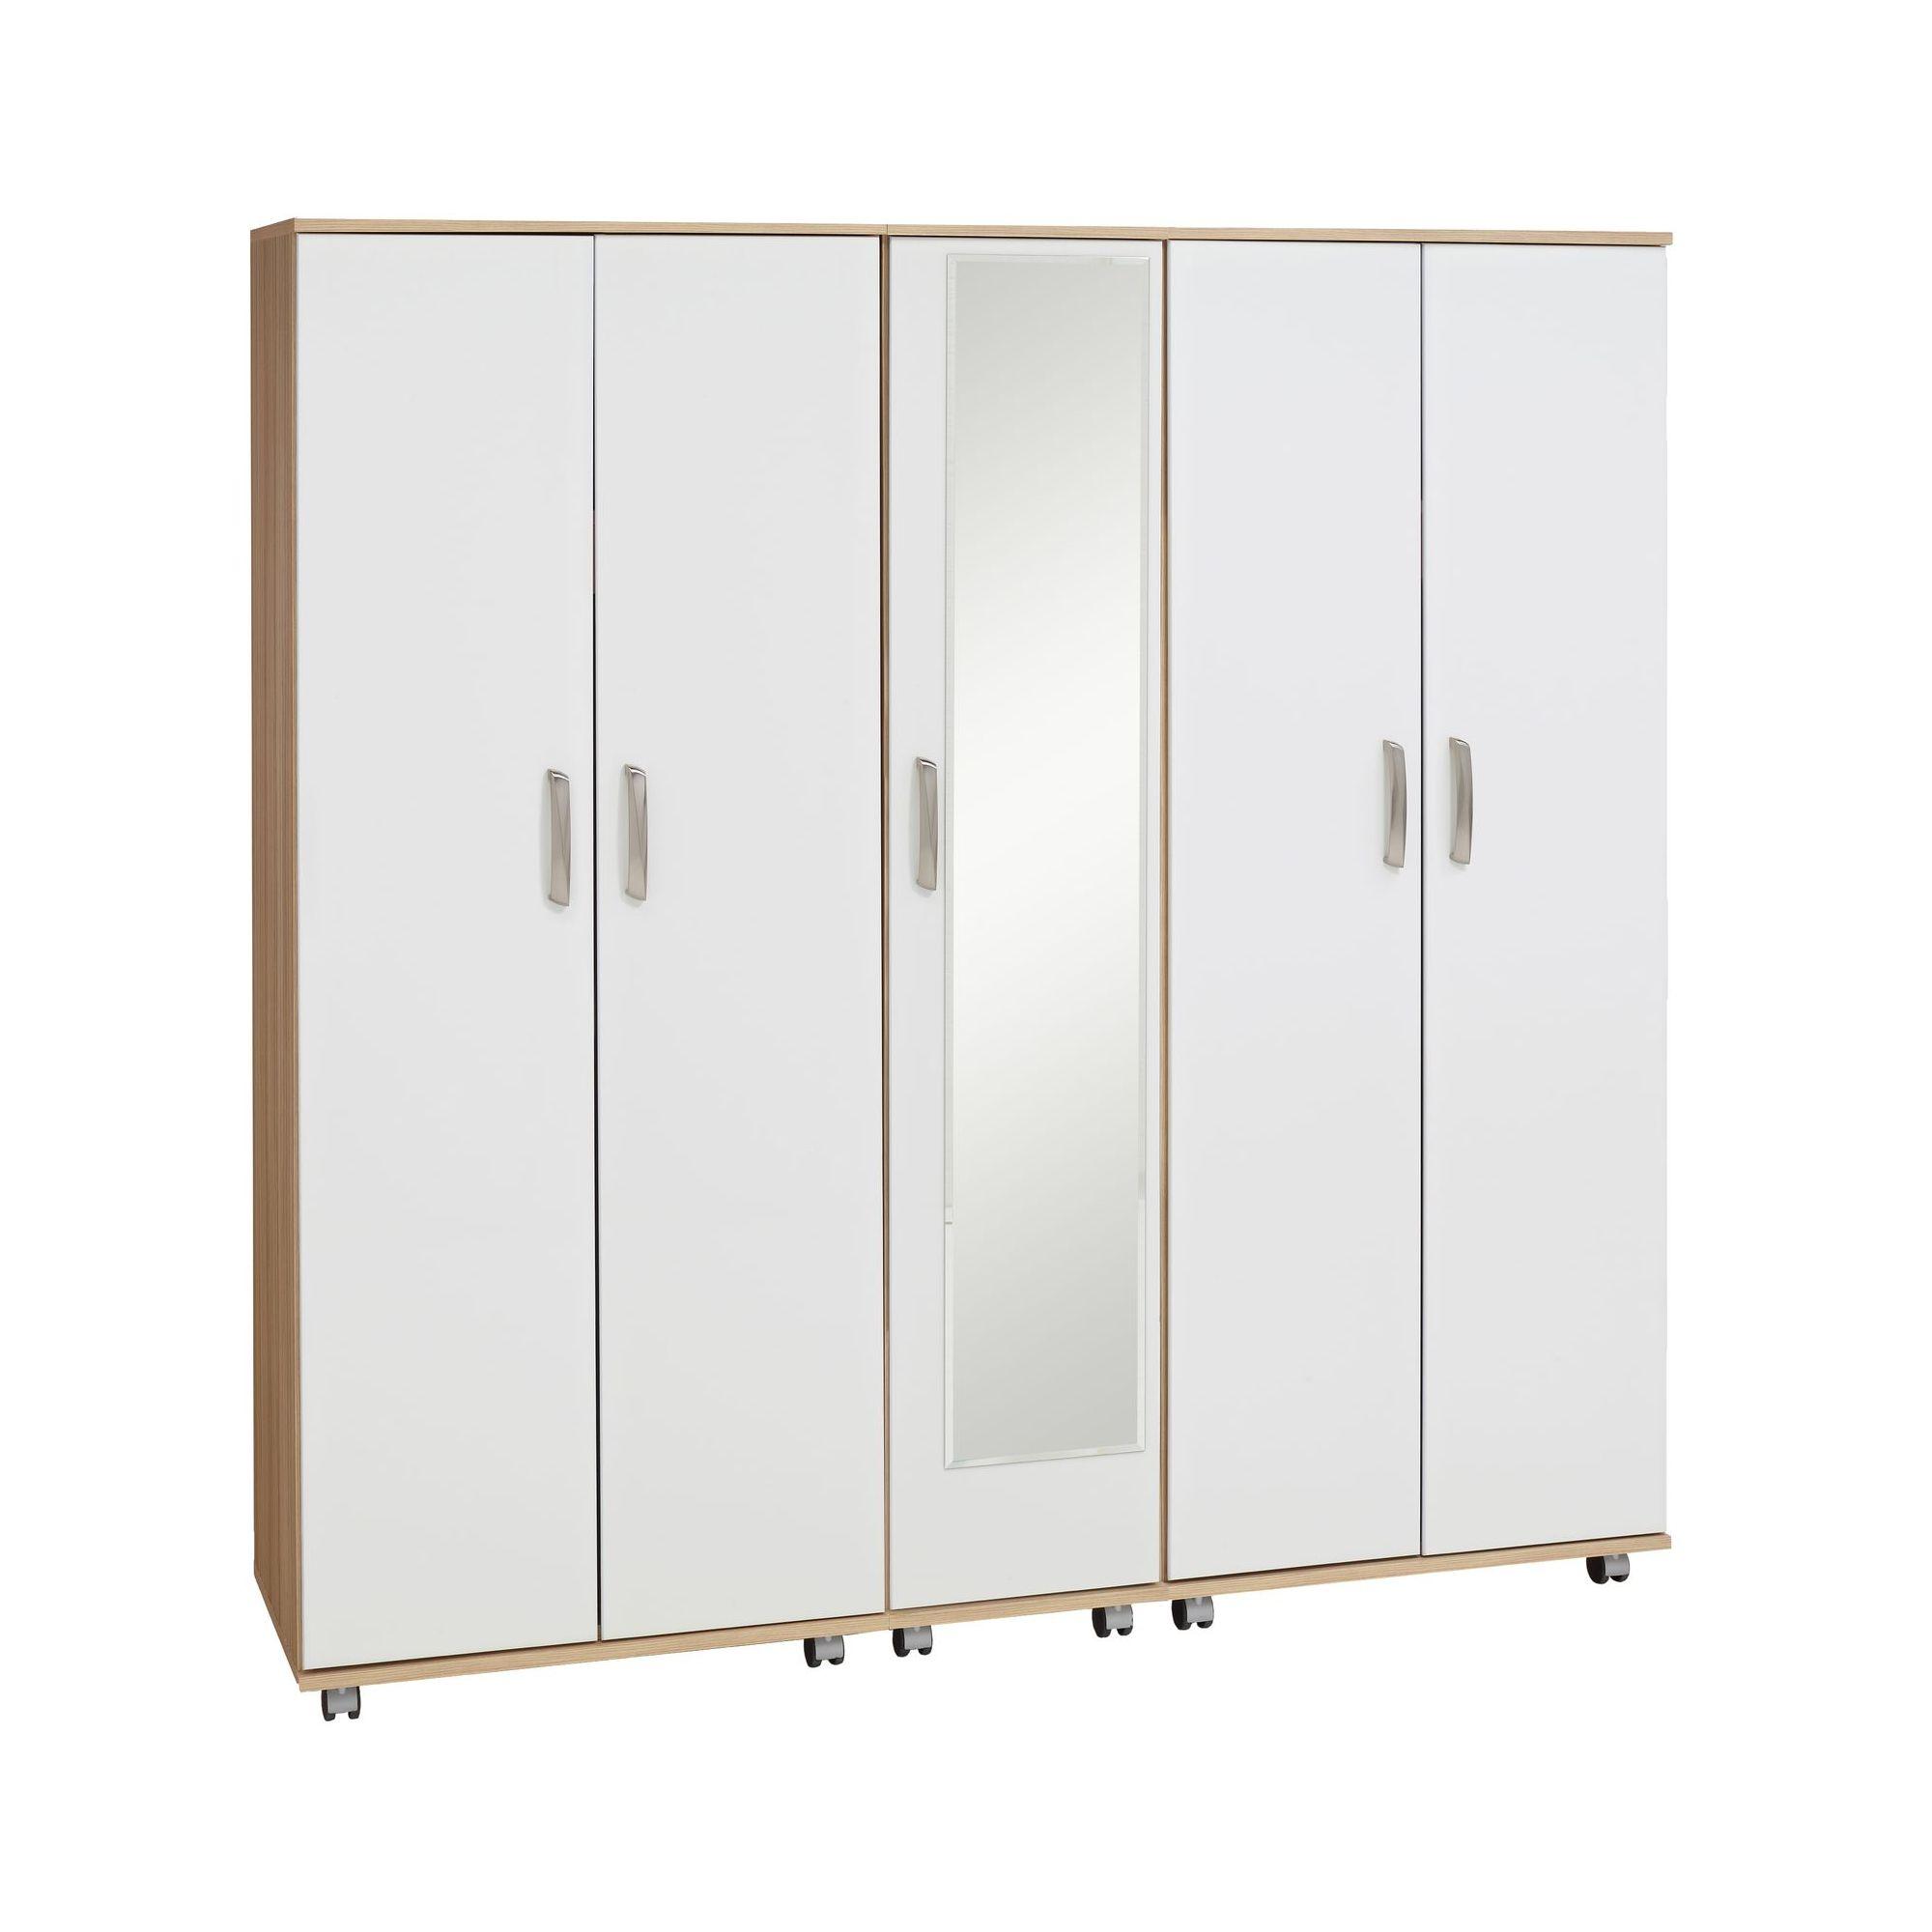 Ideal Furniture Regal 5 Door Wardrobe in white at Tesco Direct